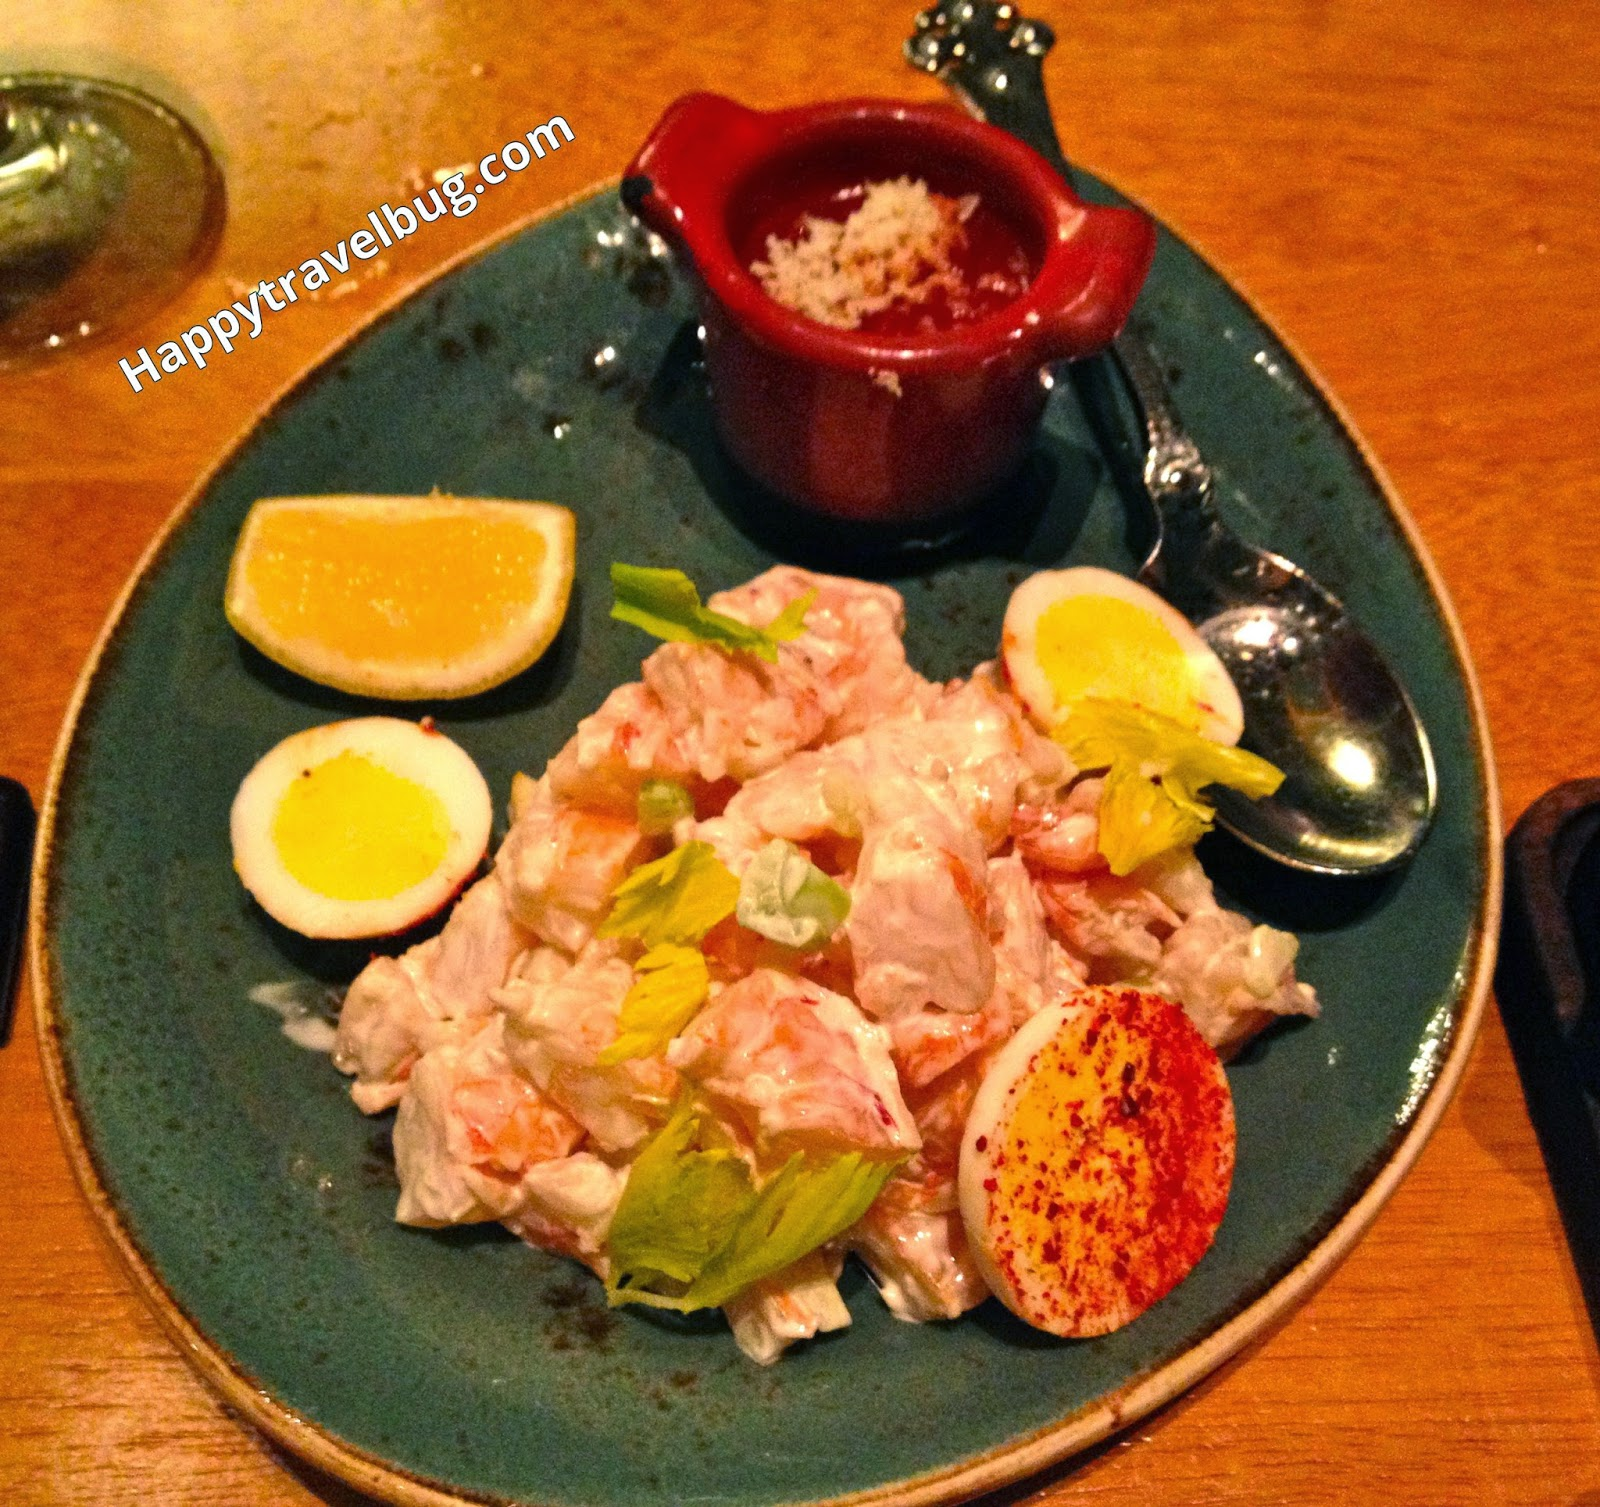 Shrimp salad from Gordon Ramsay's Pub and Grill